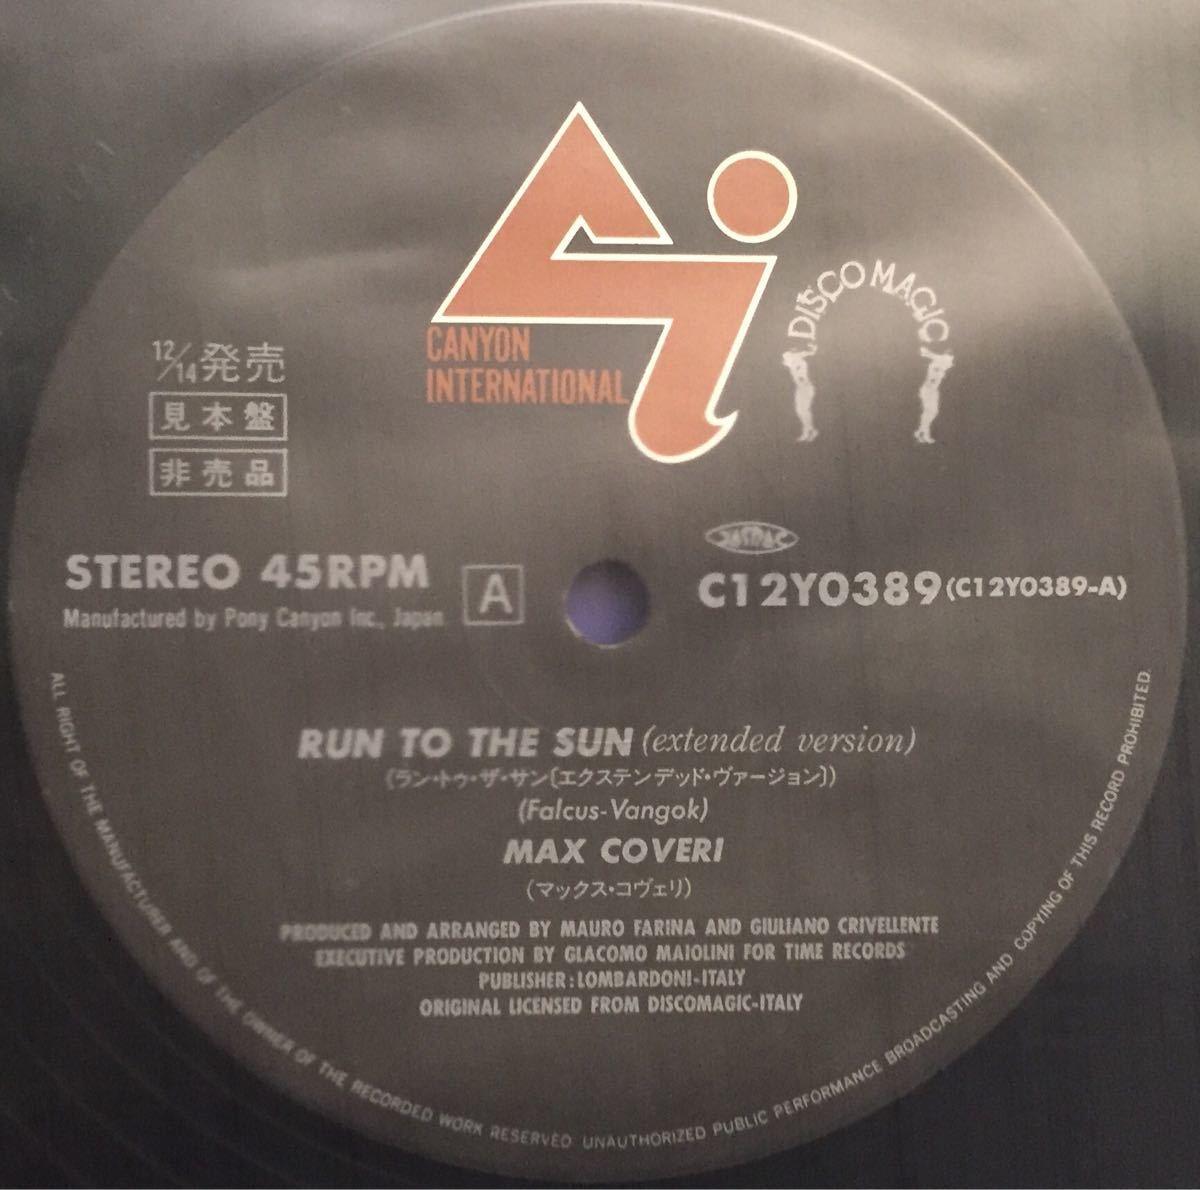 【国内プロモ盤/帯付】【美盤/美品】【即決】【LP】Max Coveri Run To The Sun / 試聴検品済_画像3